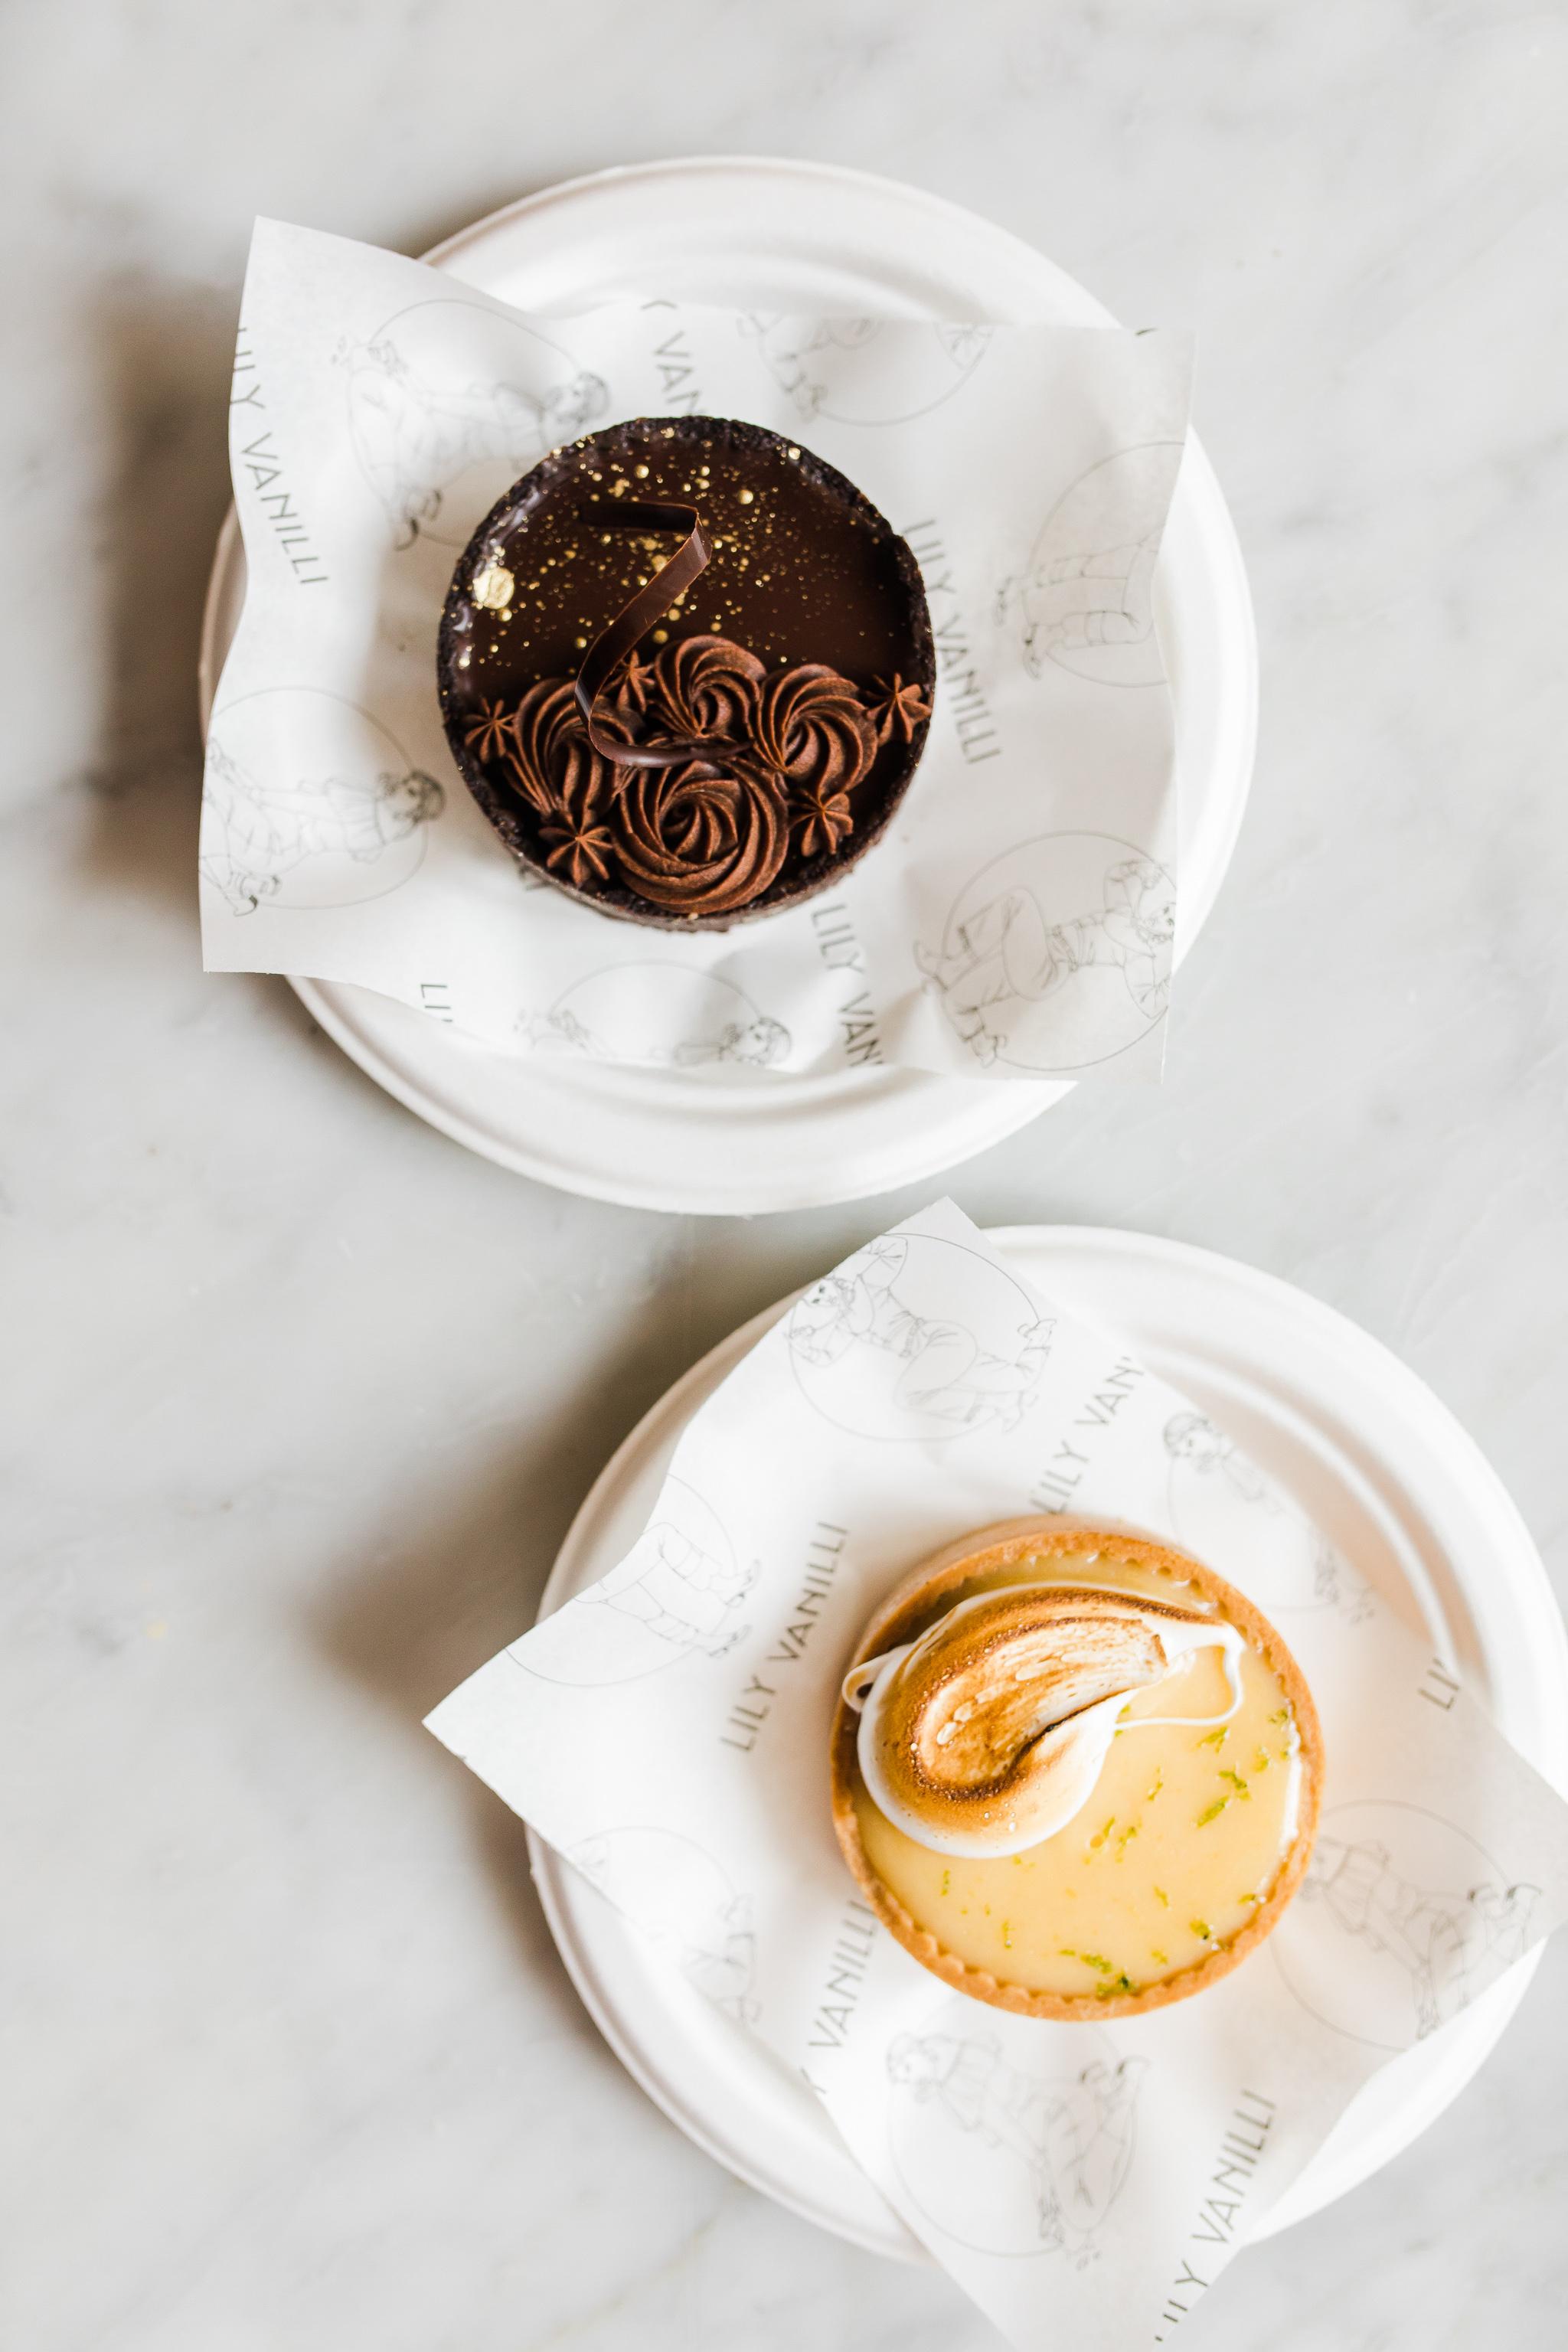 Lily Vanili Cafe Cakes Close Up.jpg